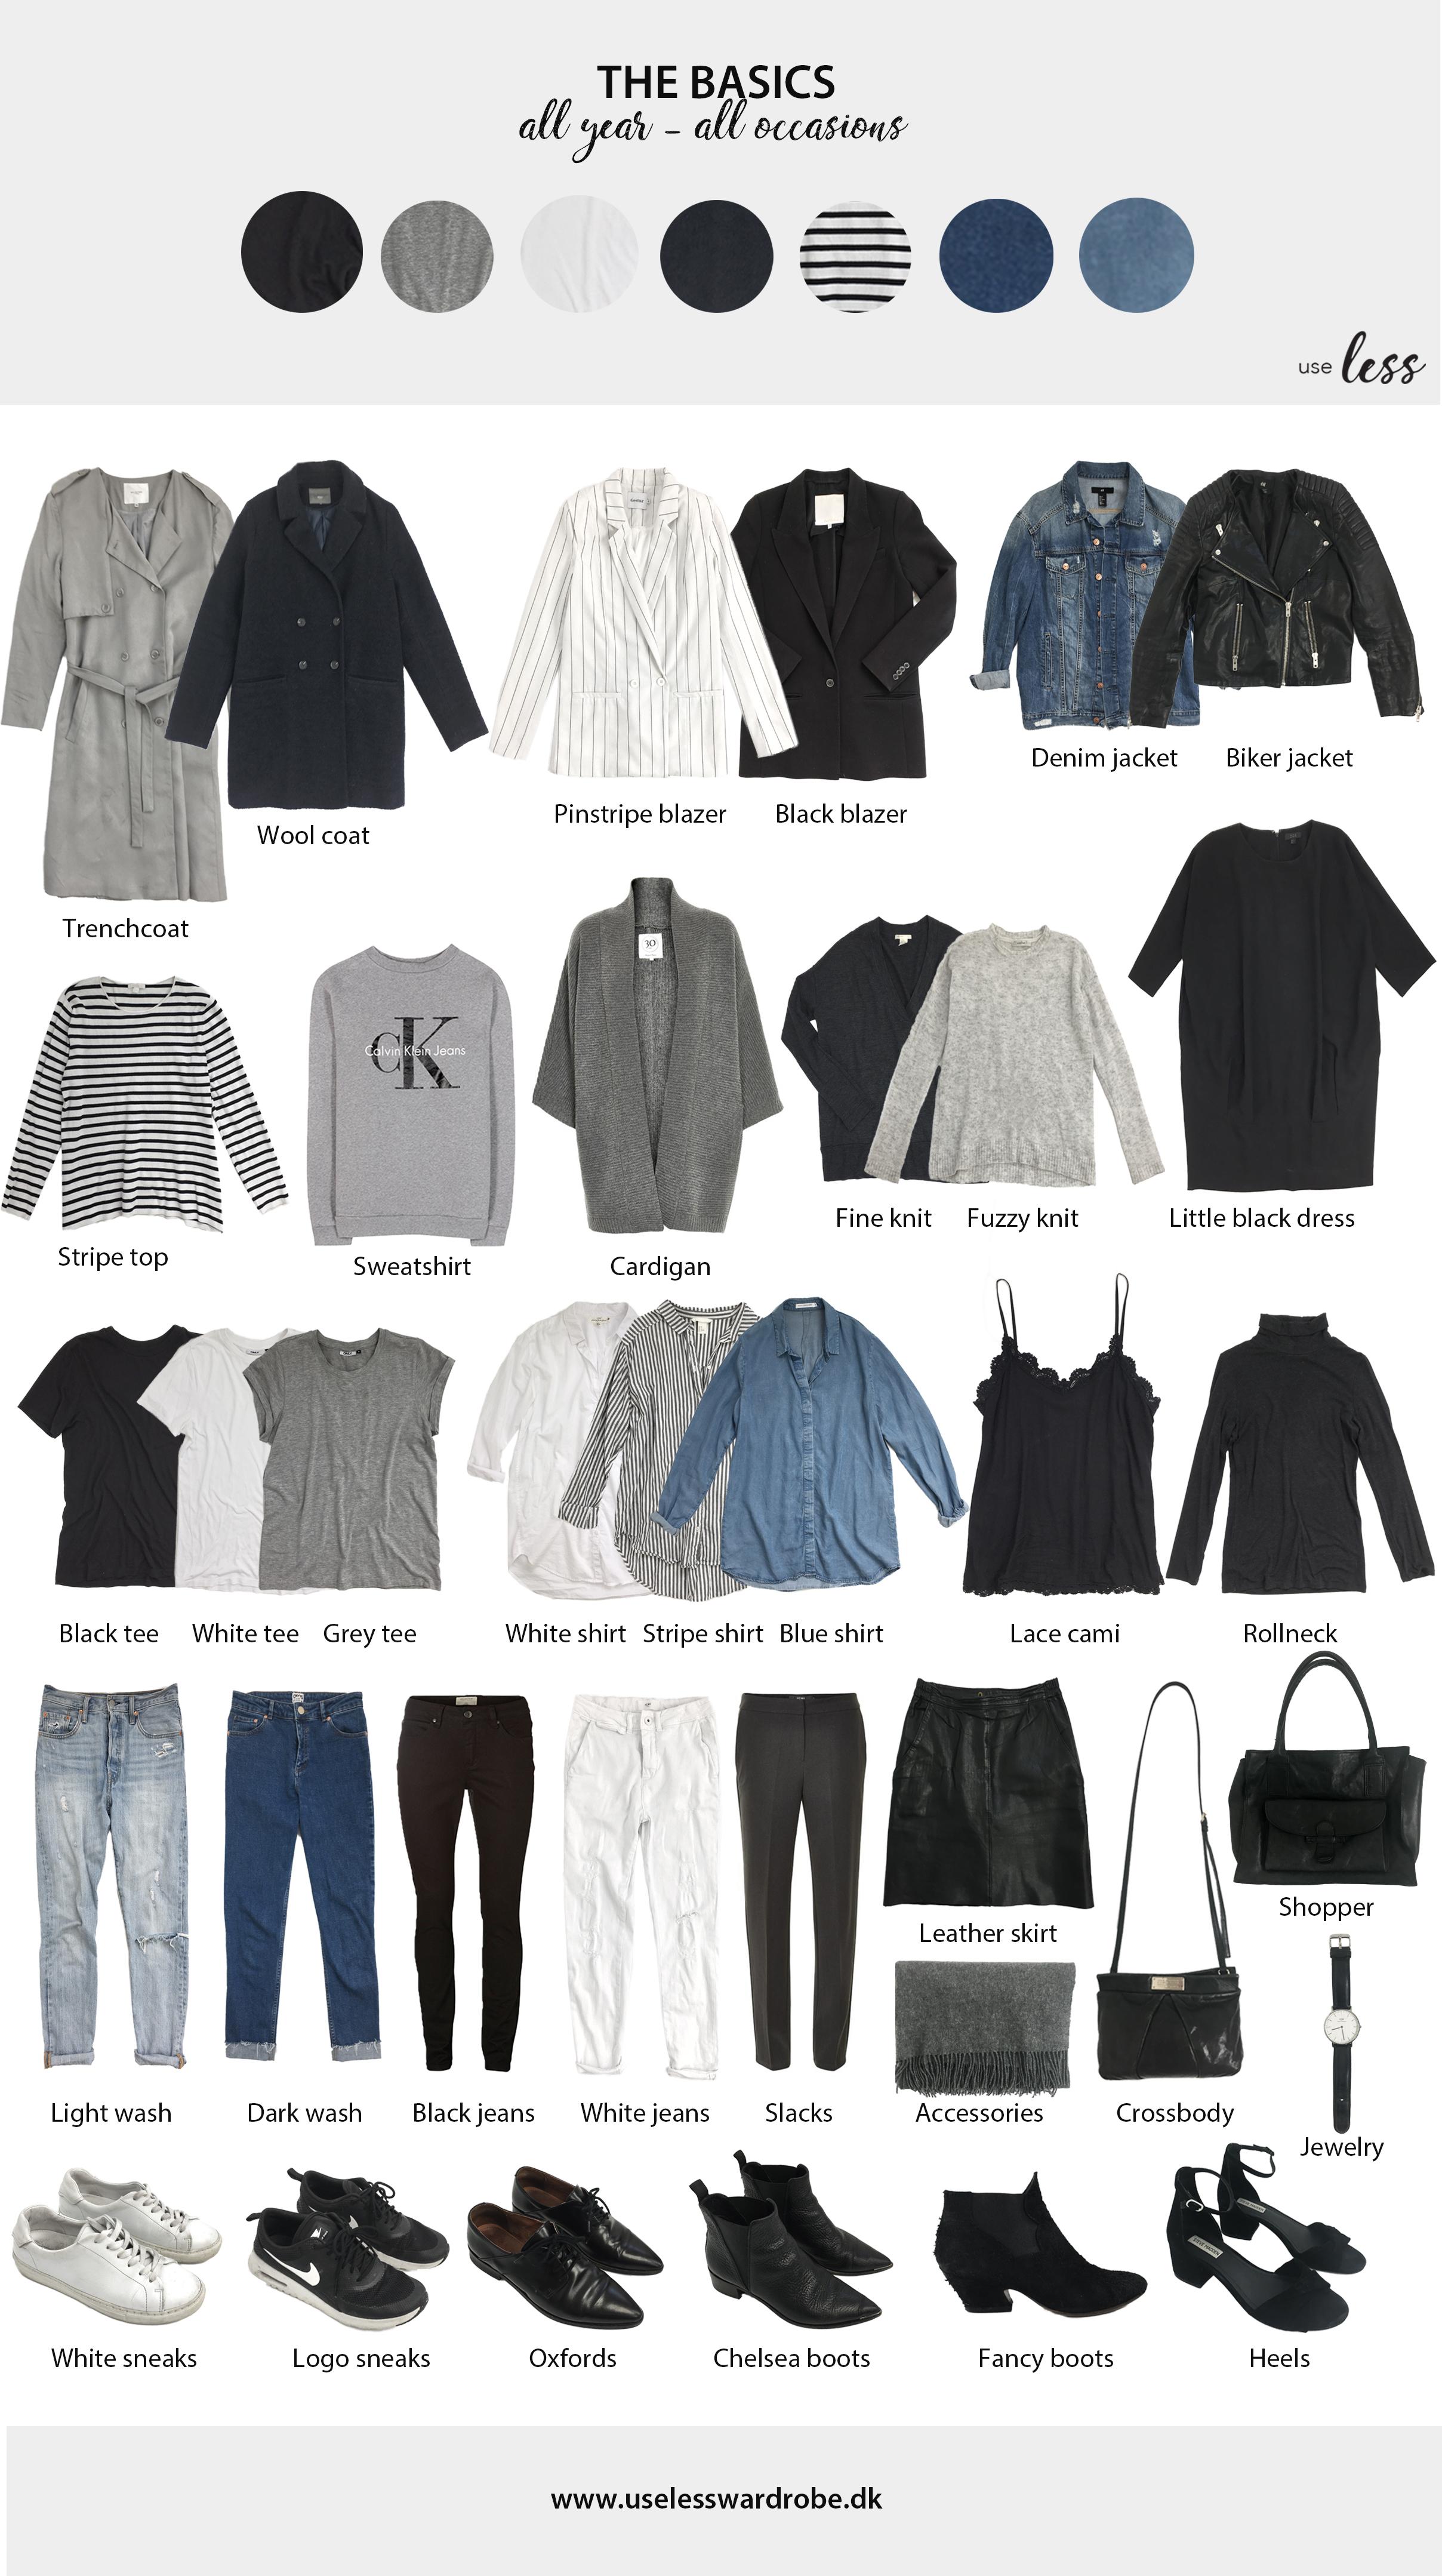 c4551c9e238a3 Capsule wardrobe  what